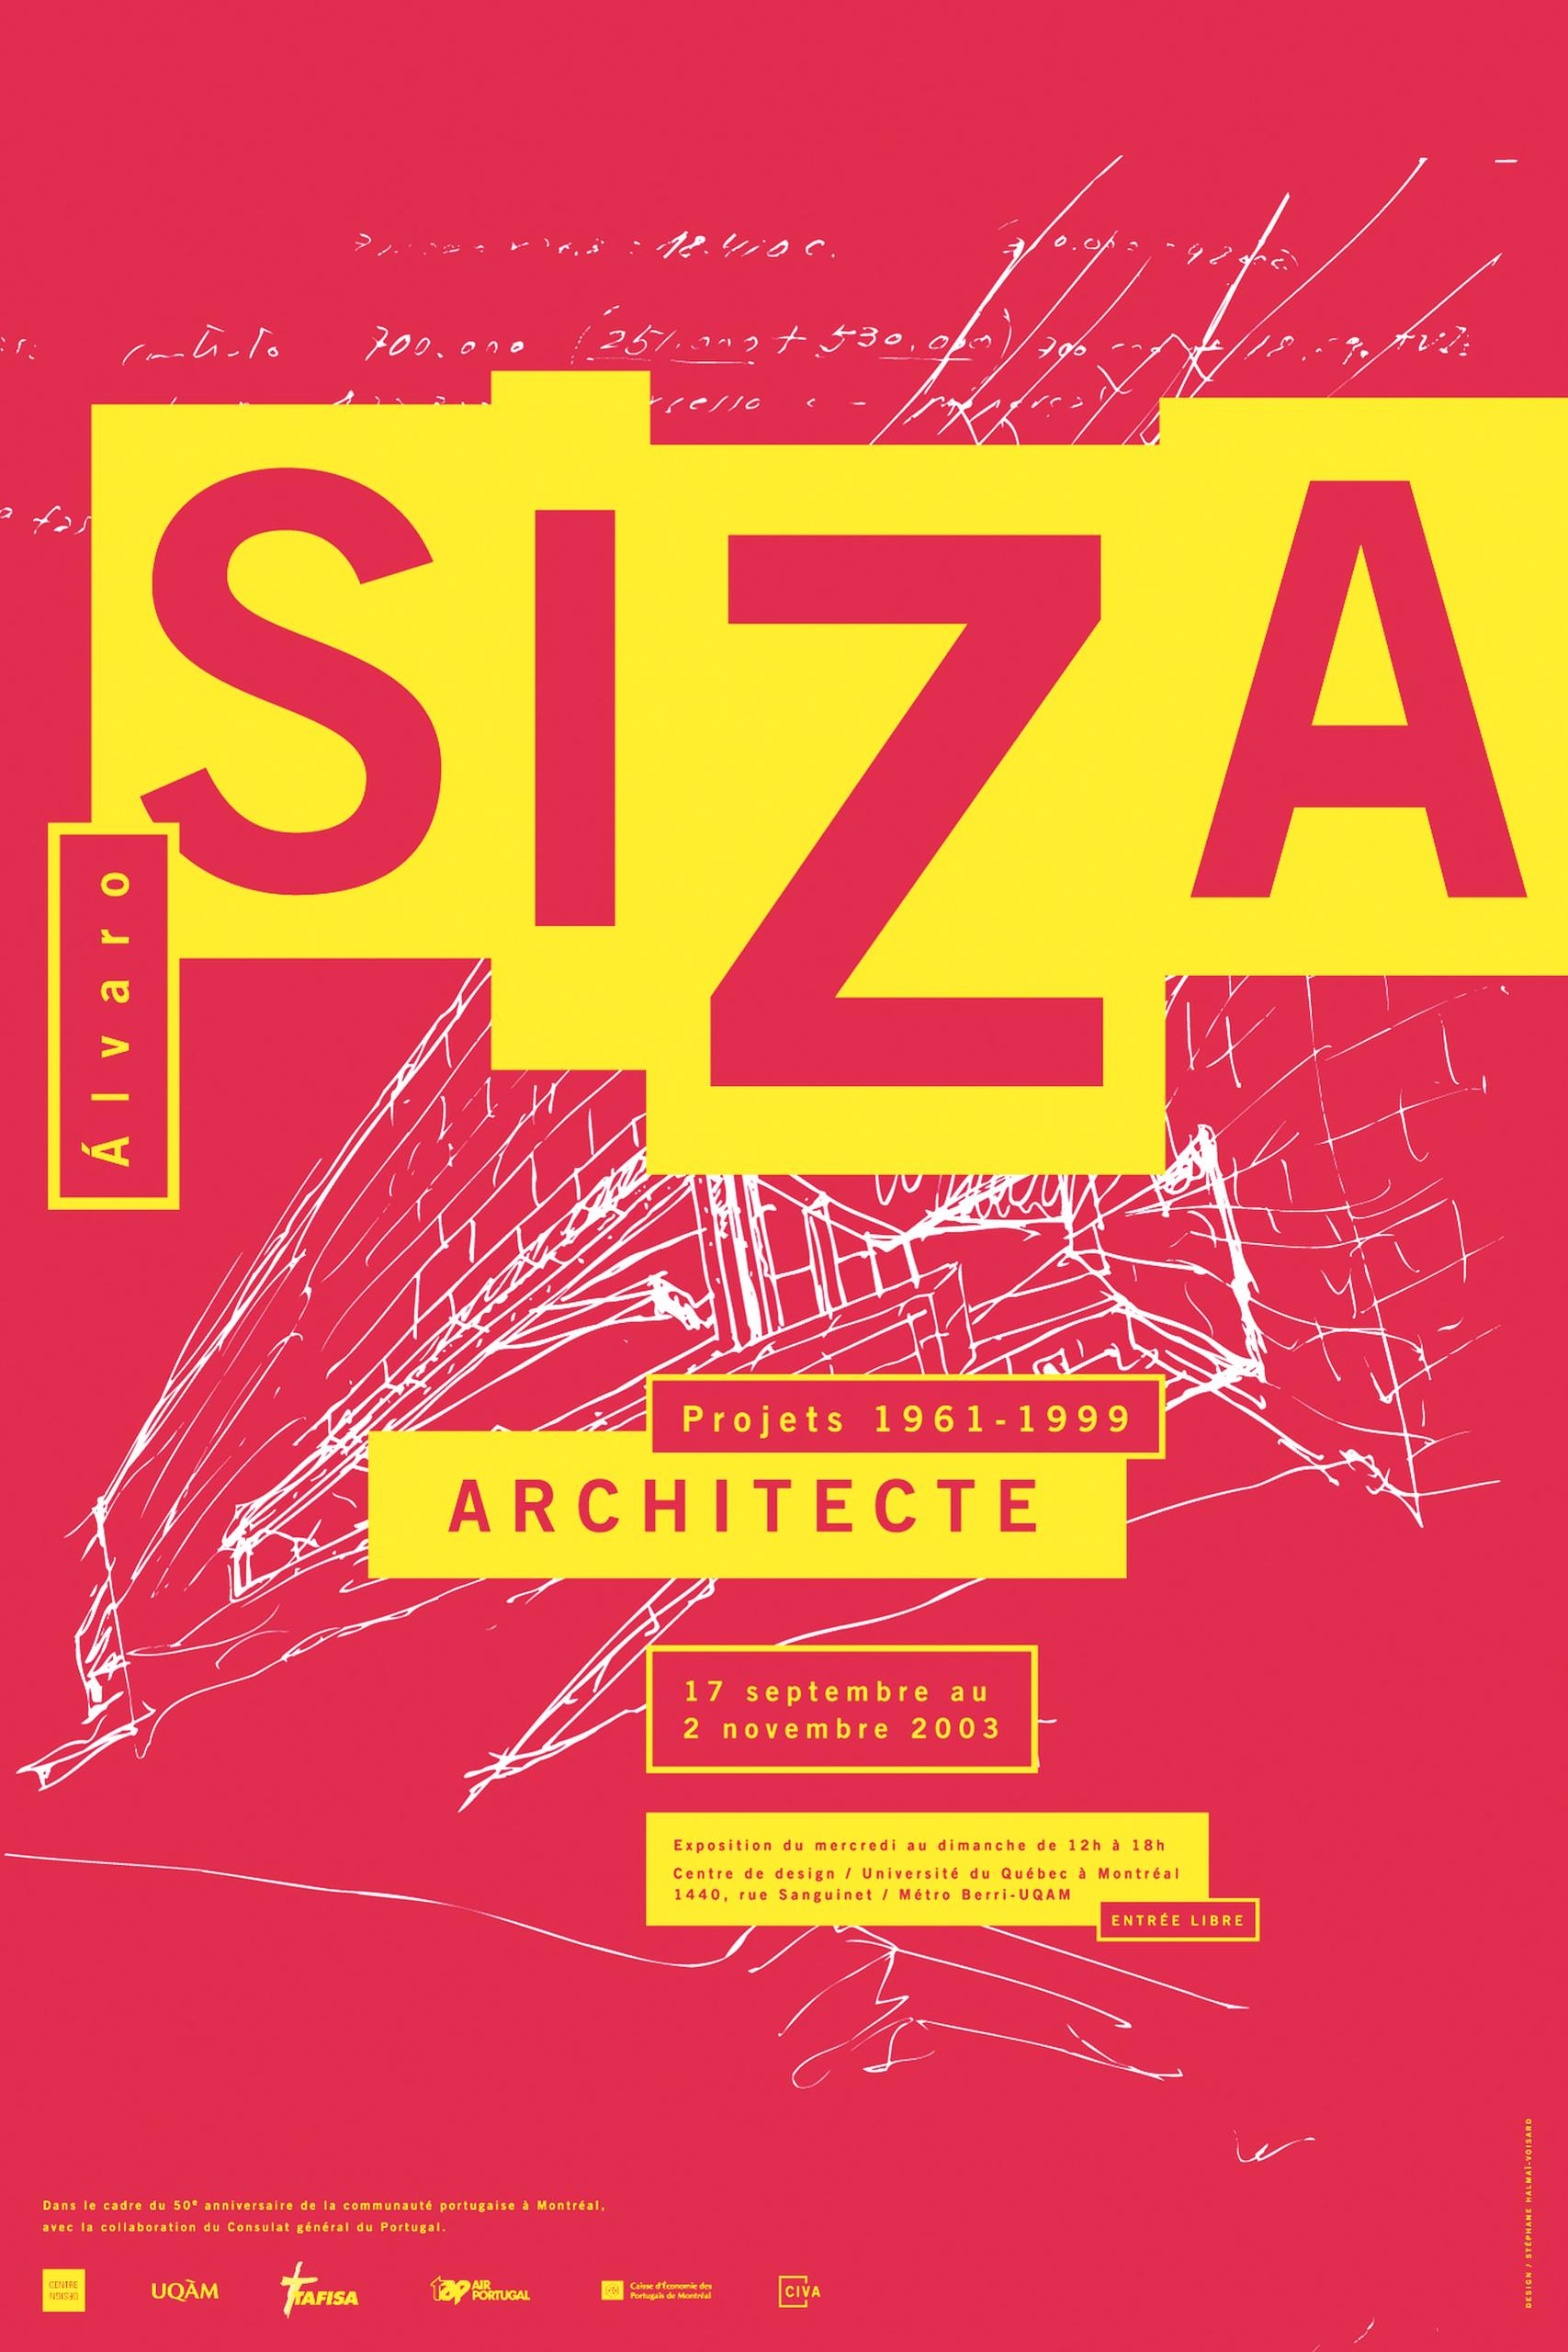 2003 - Exposition - Alvaro Siza architecte projets 1961-1999 ©Stéphane Huot